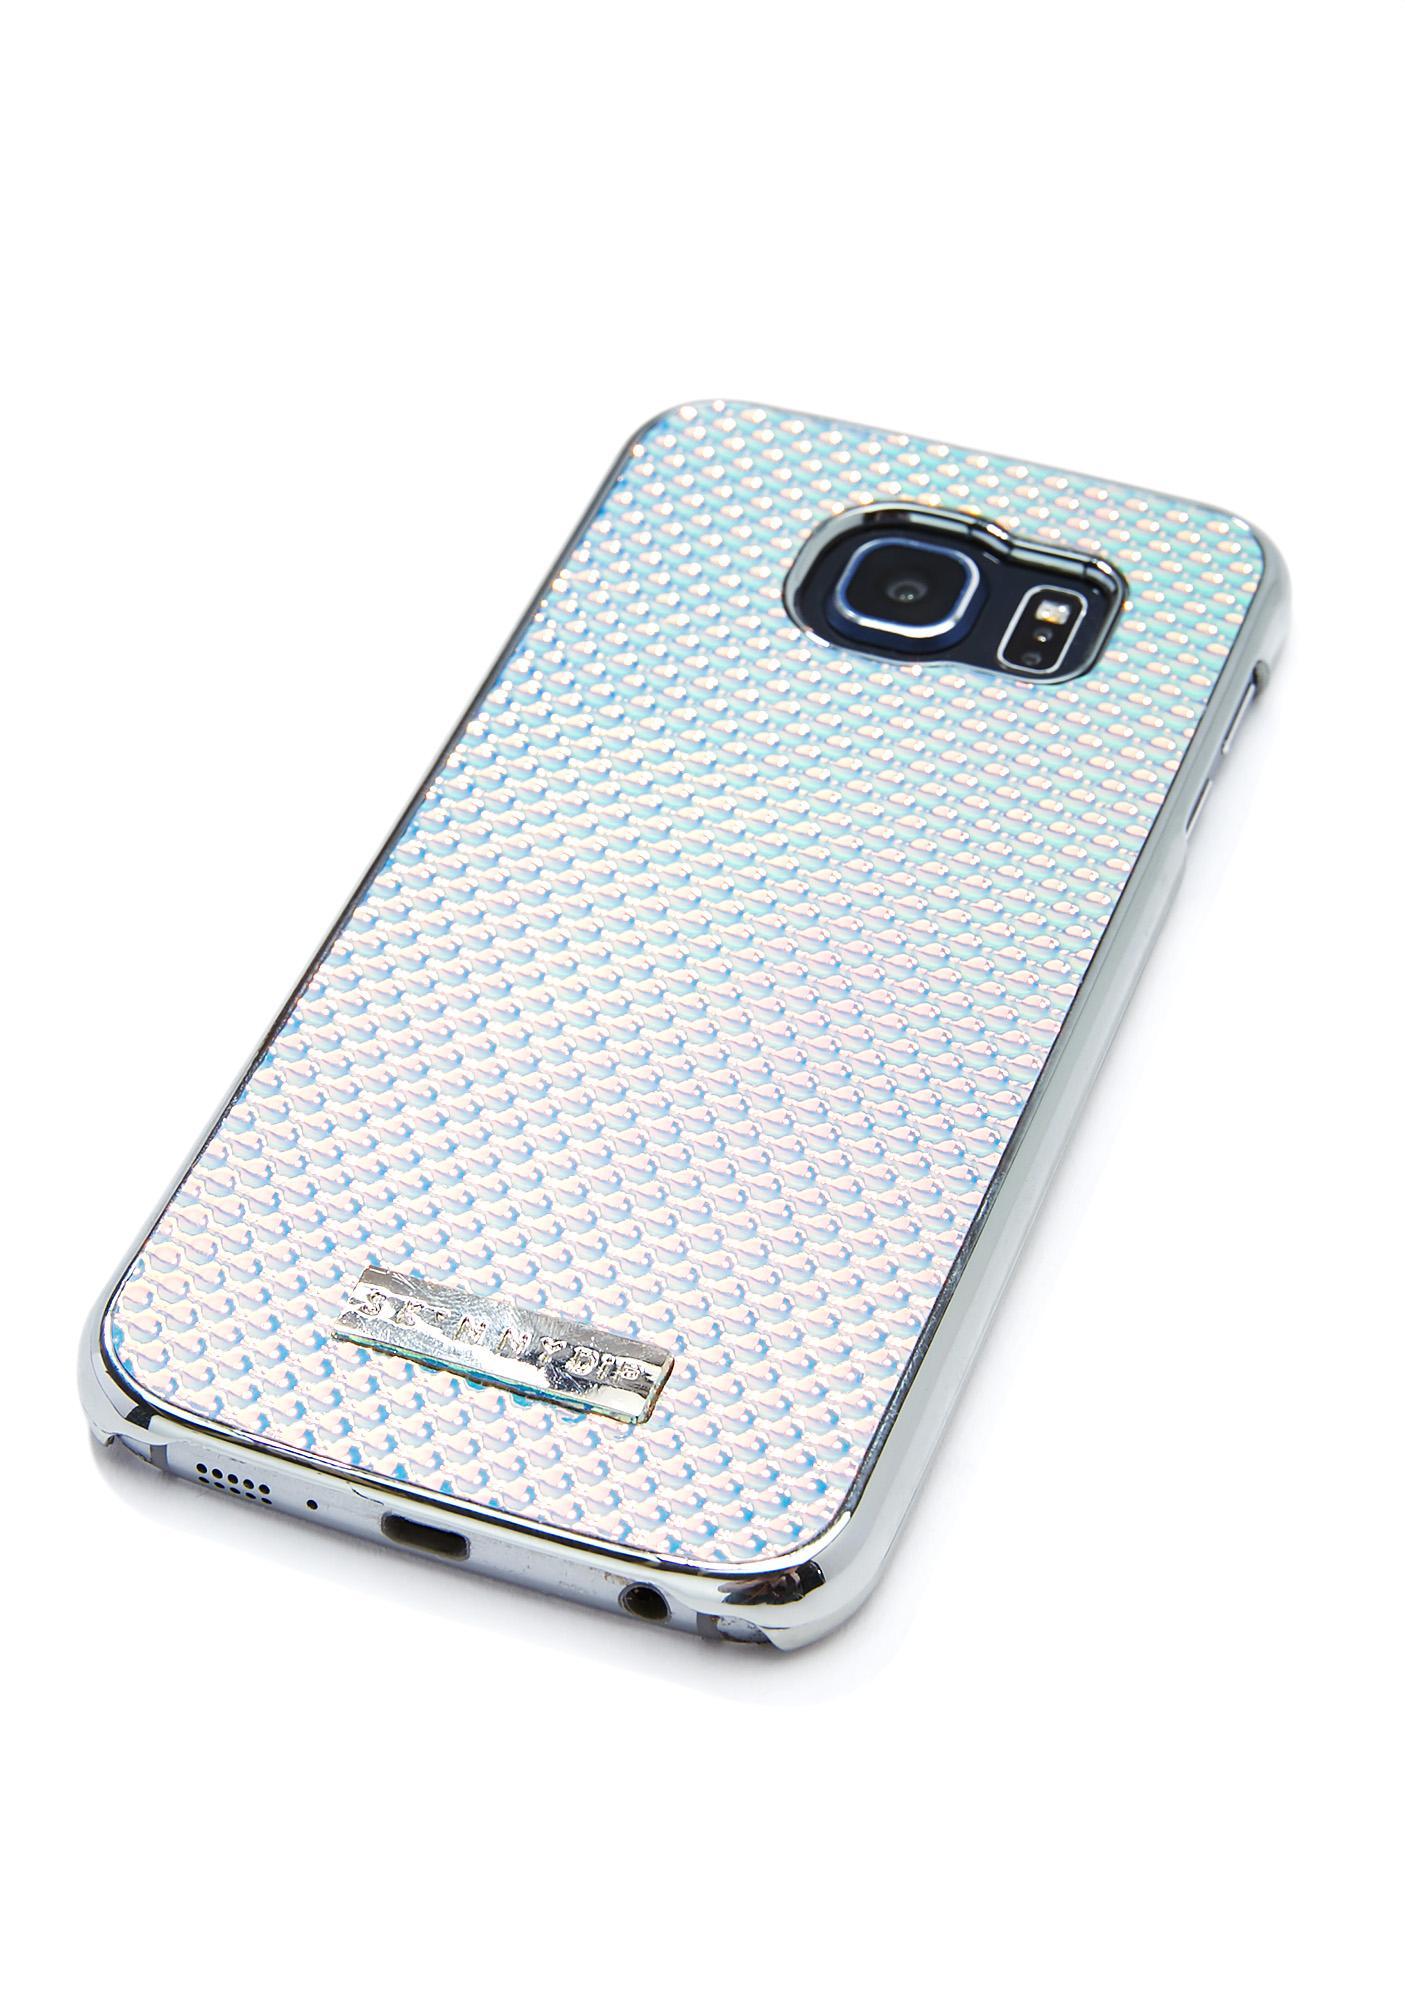 Skinnydip Holo Samsung Phone Case